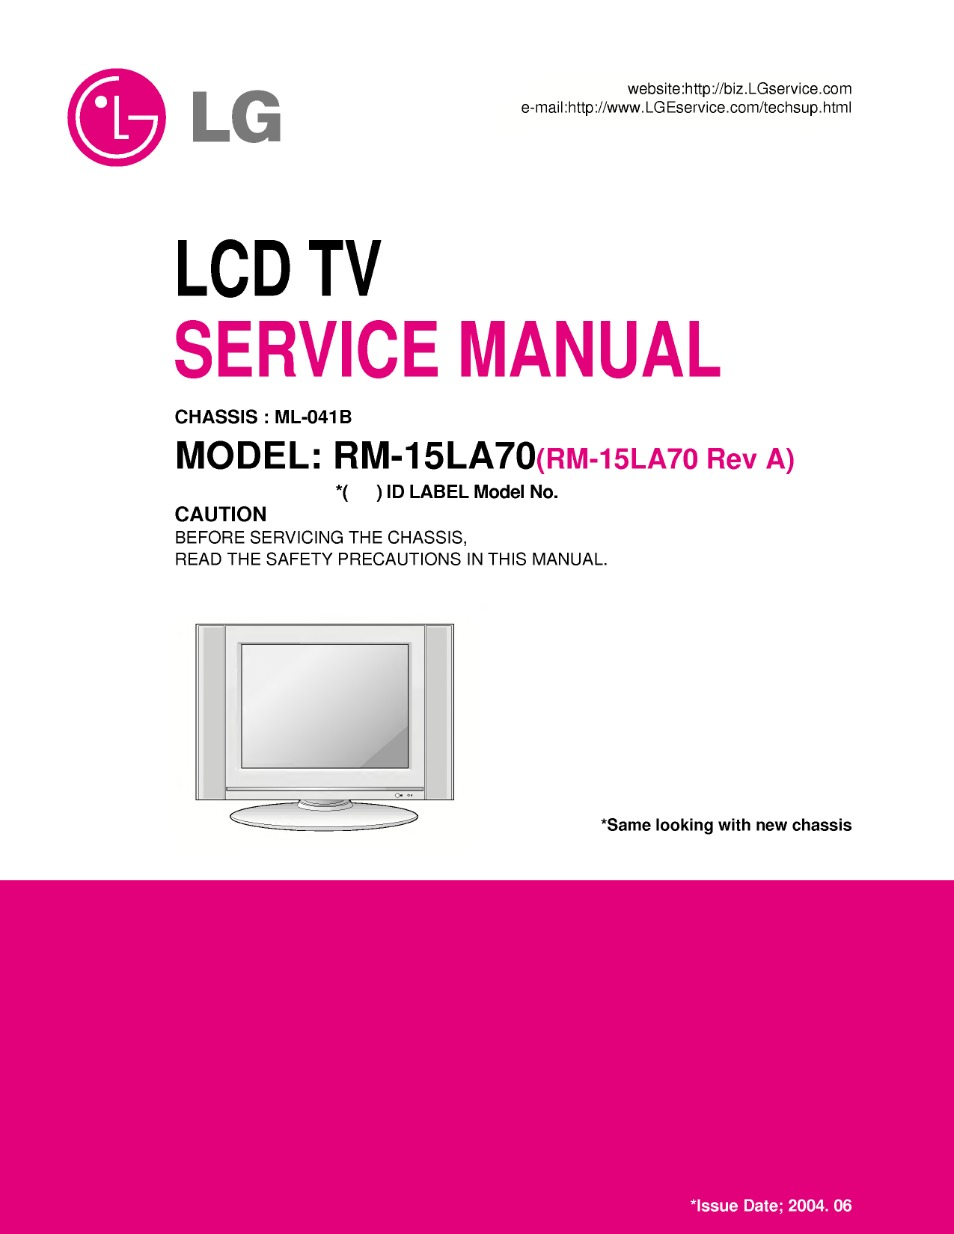 rm-15la70 (chassis:ml-041b) service manual